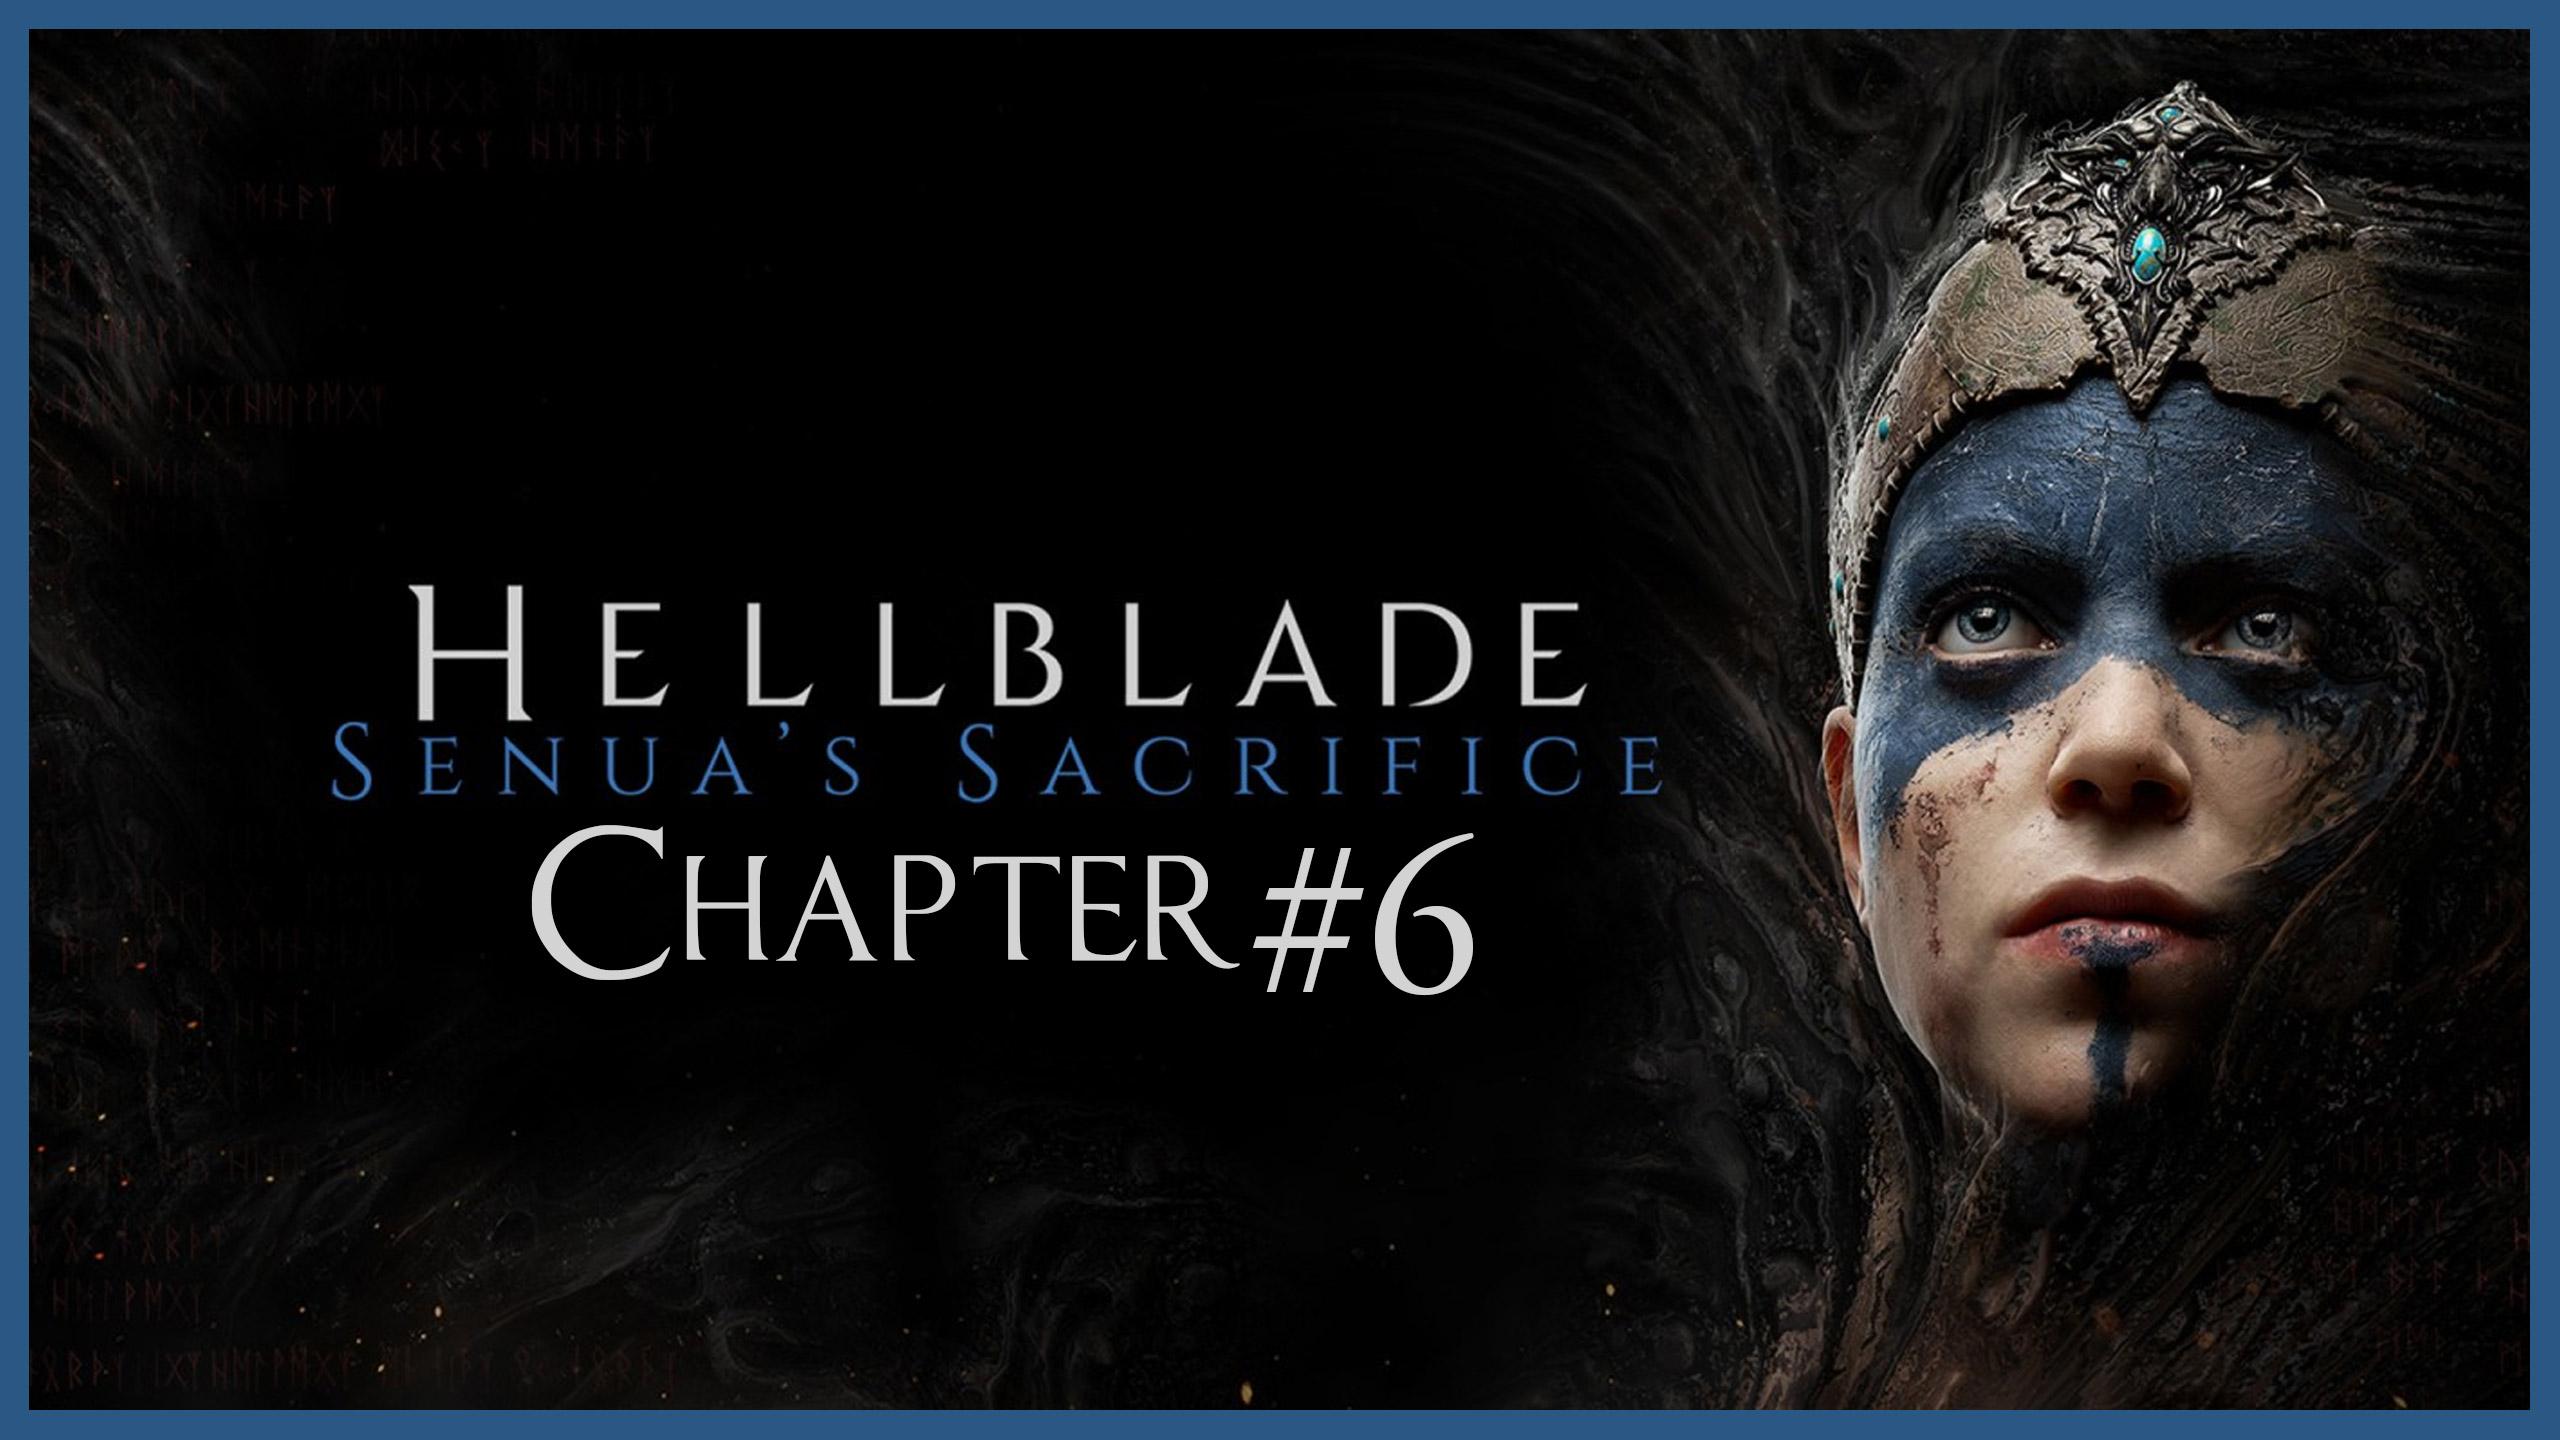 Hellblade Senua's Sacrifice. Все камни знаний. Глава 6